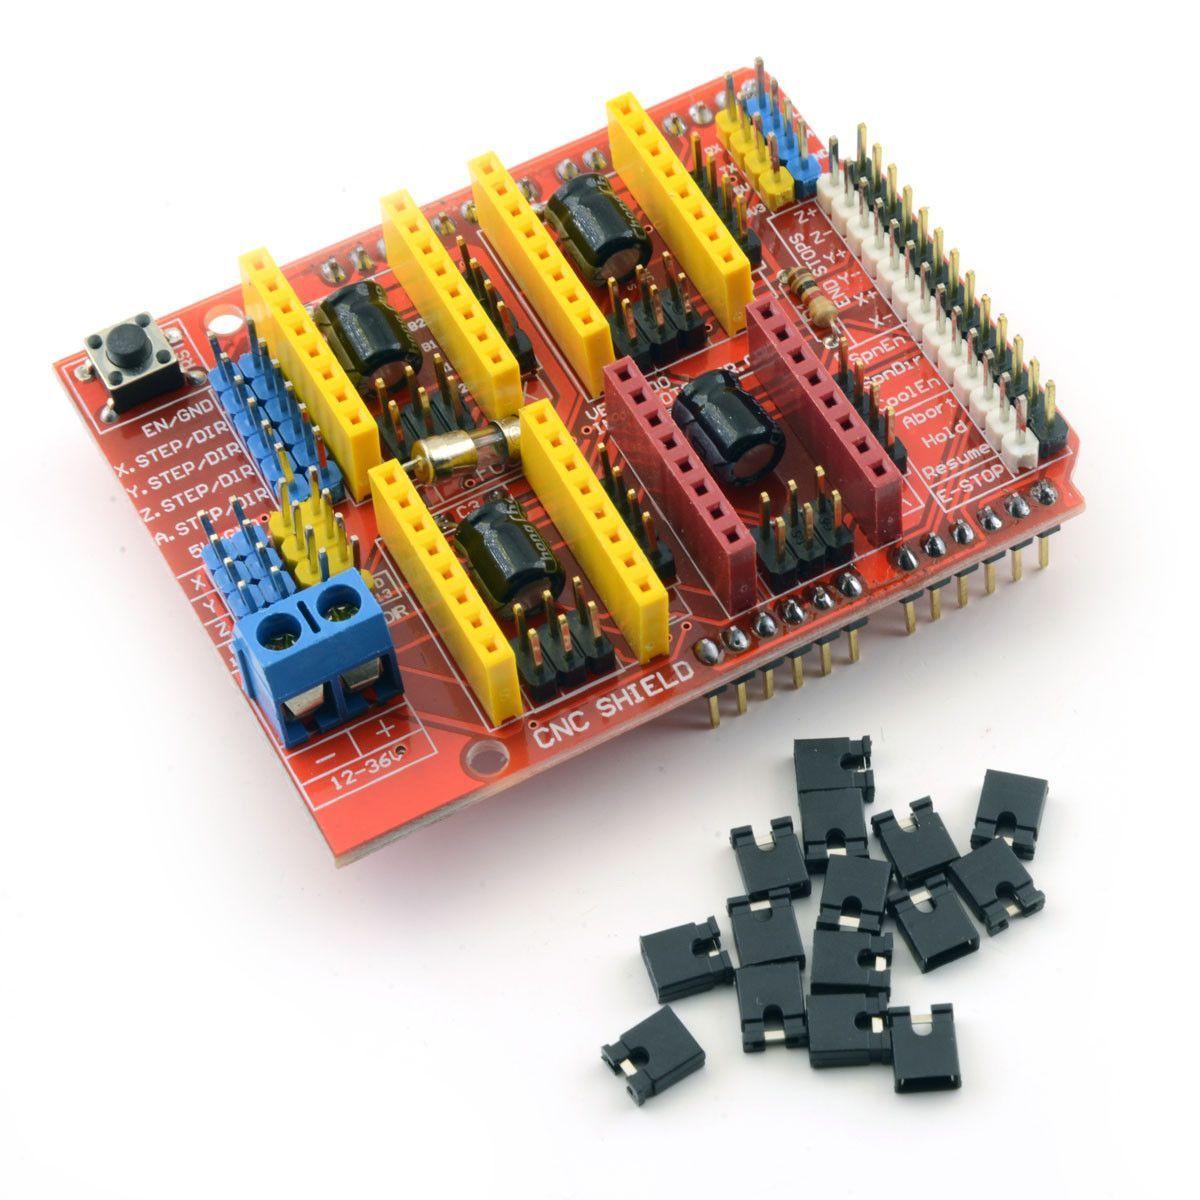 small resolution of assembled cnc v3 arduino shield for a4988 drv8825 stepsticks router mill robot